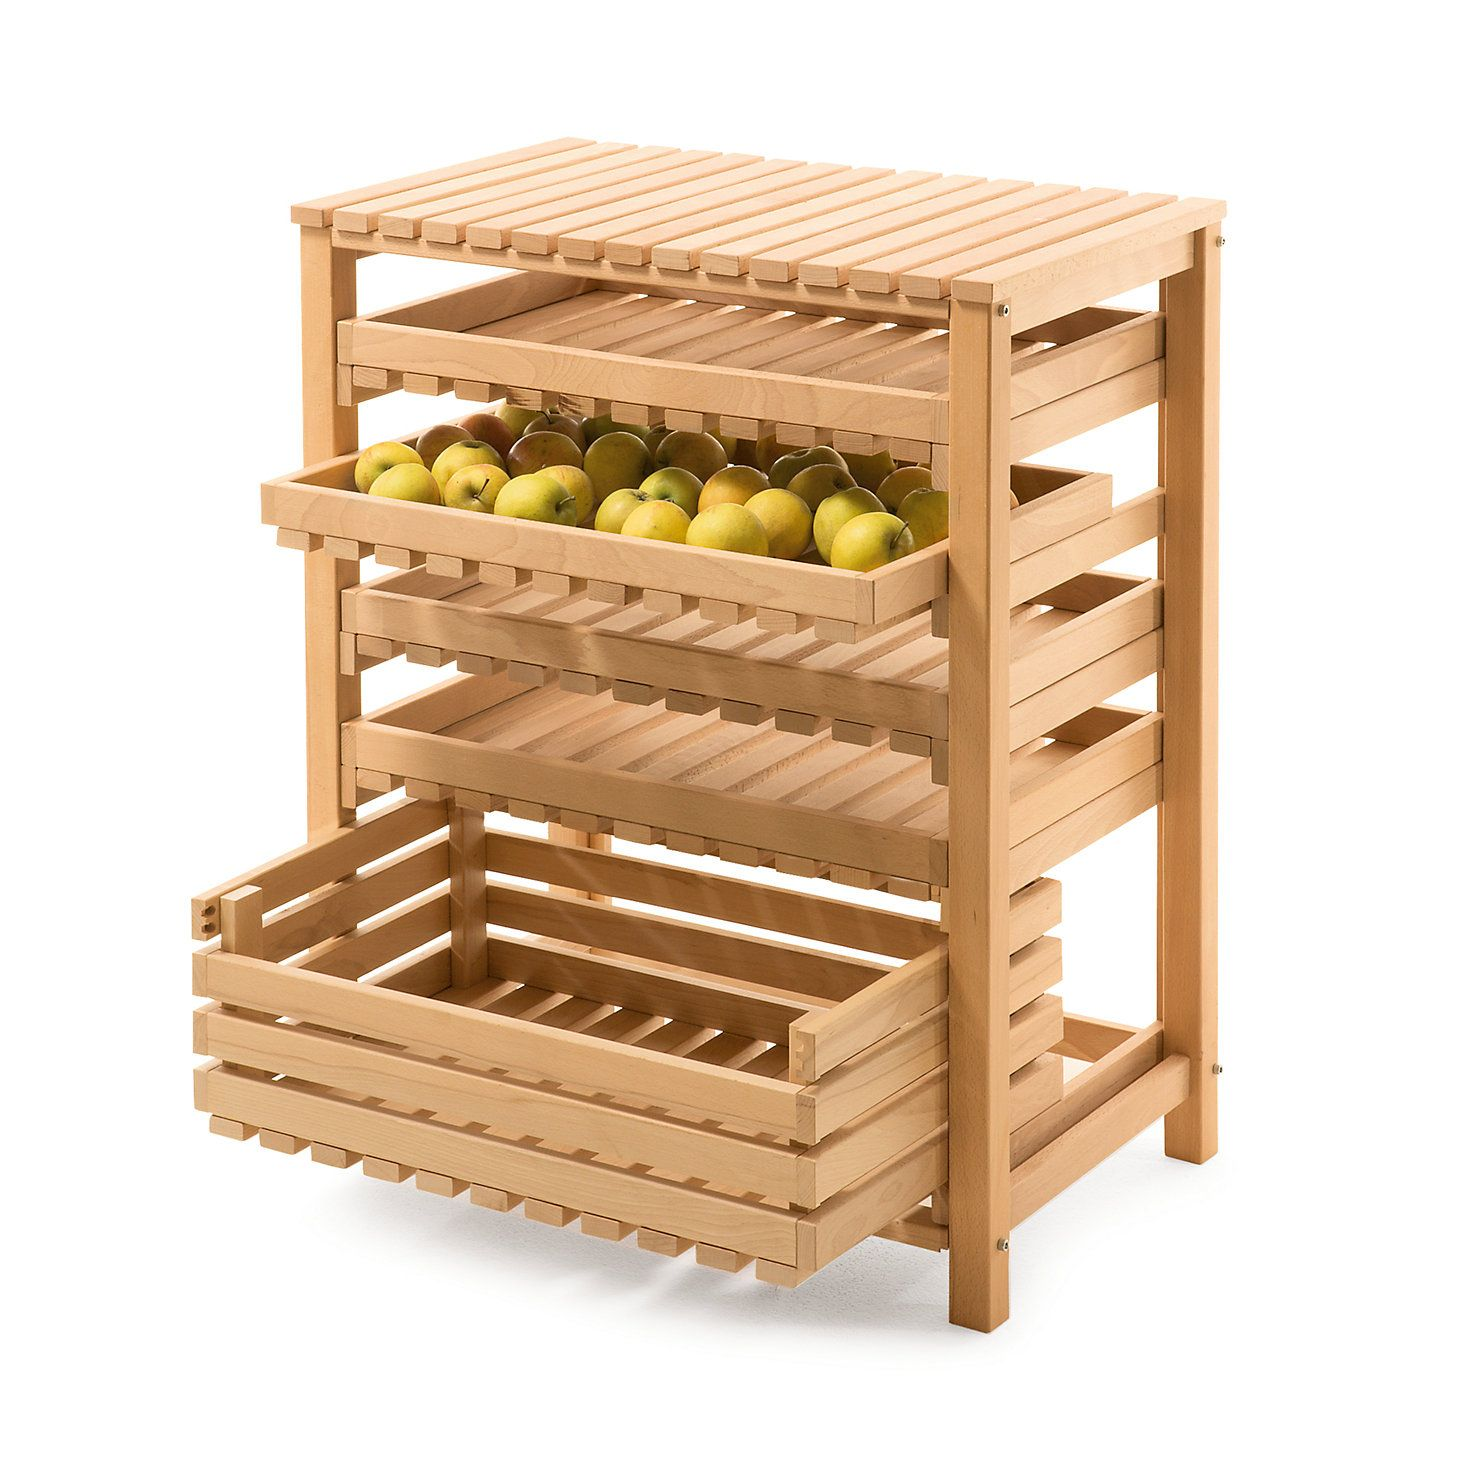 Obst und Gemüsehorde Buchenholz Buchenholz, Holz und